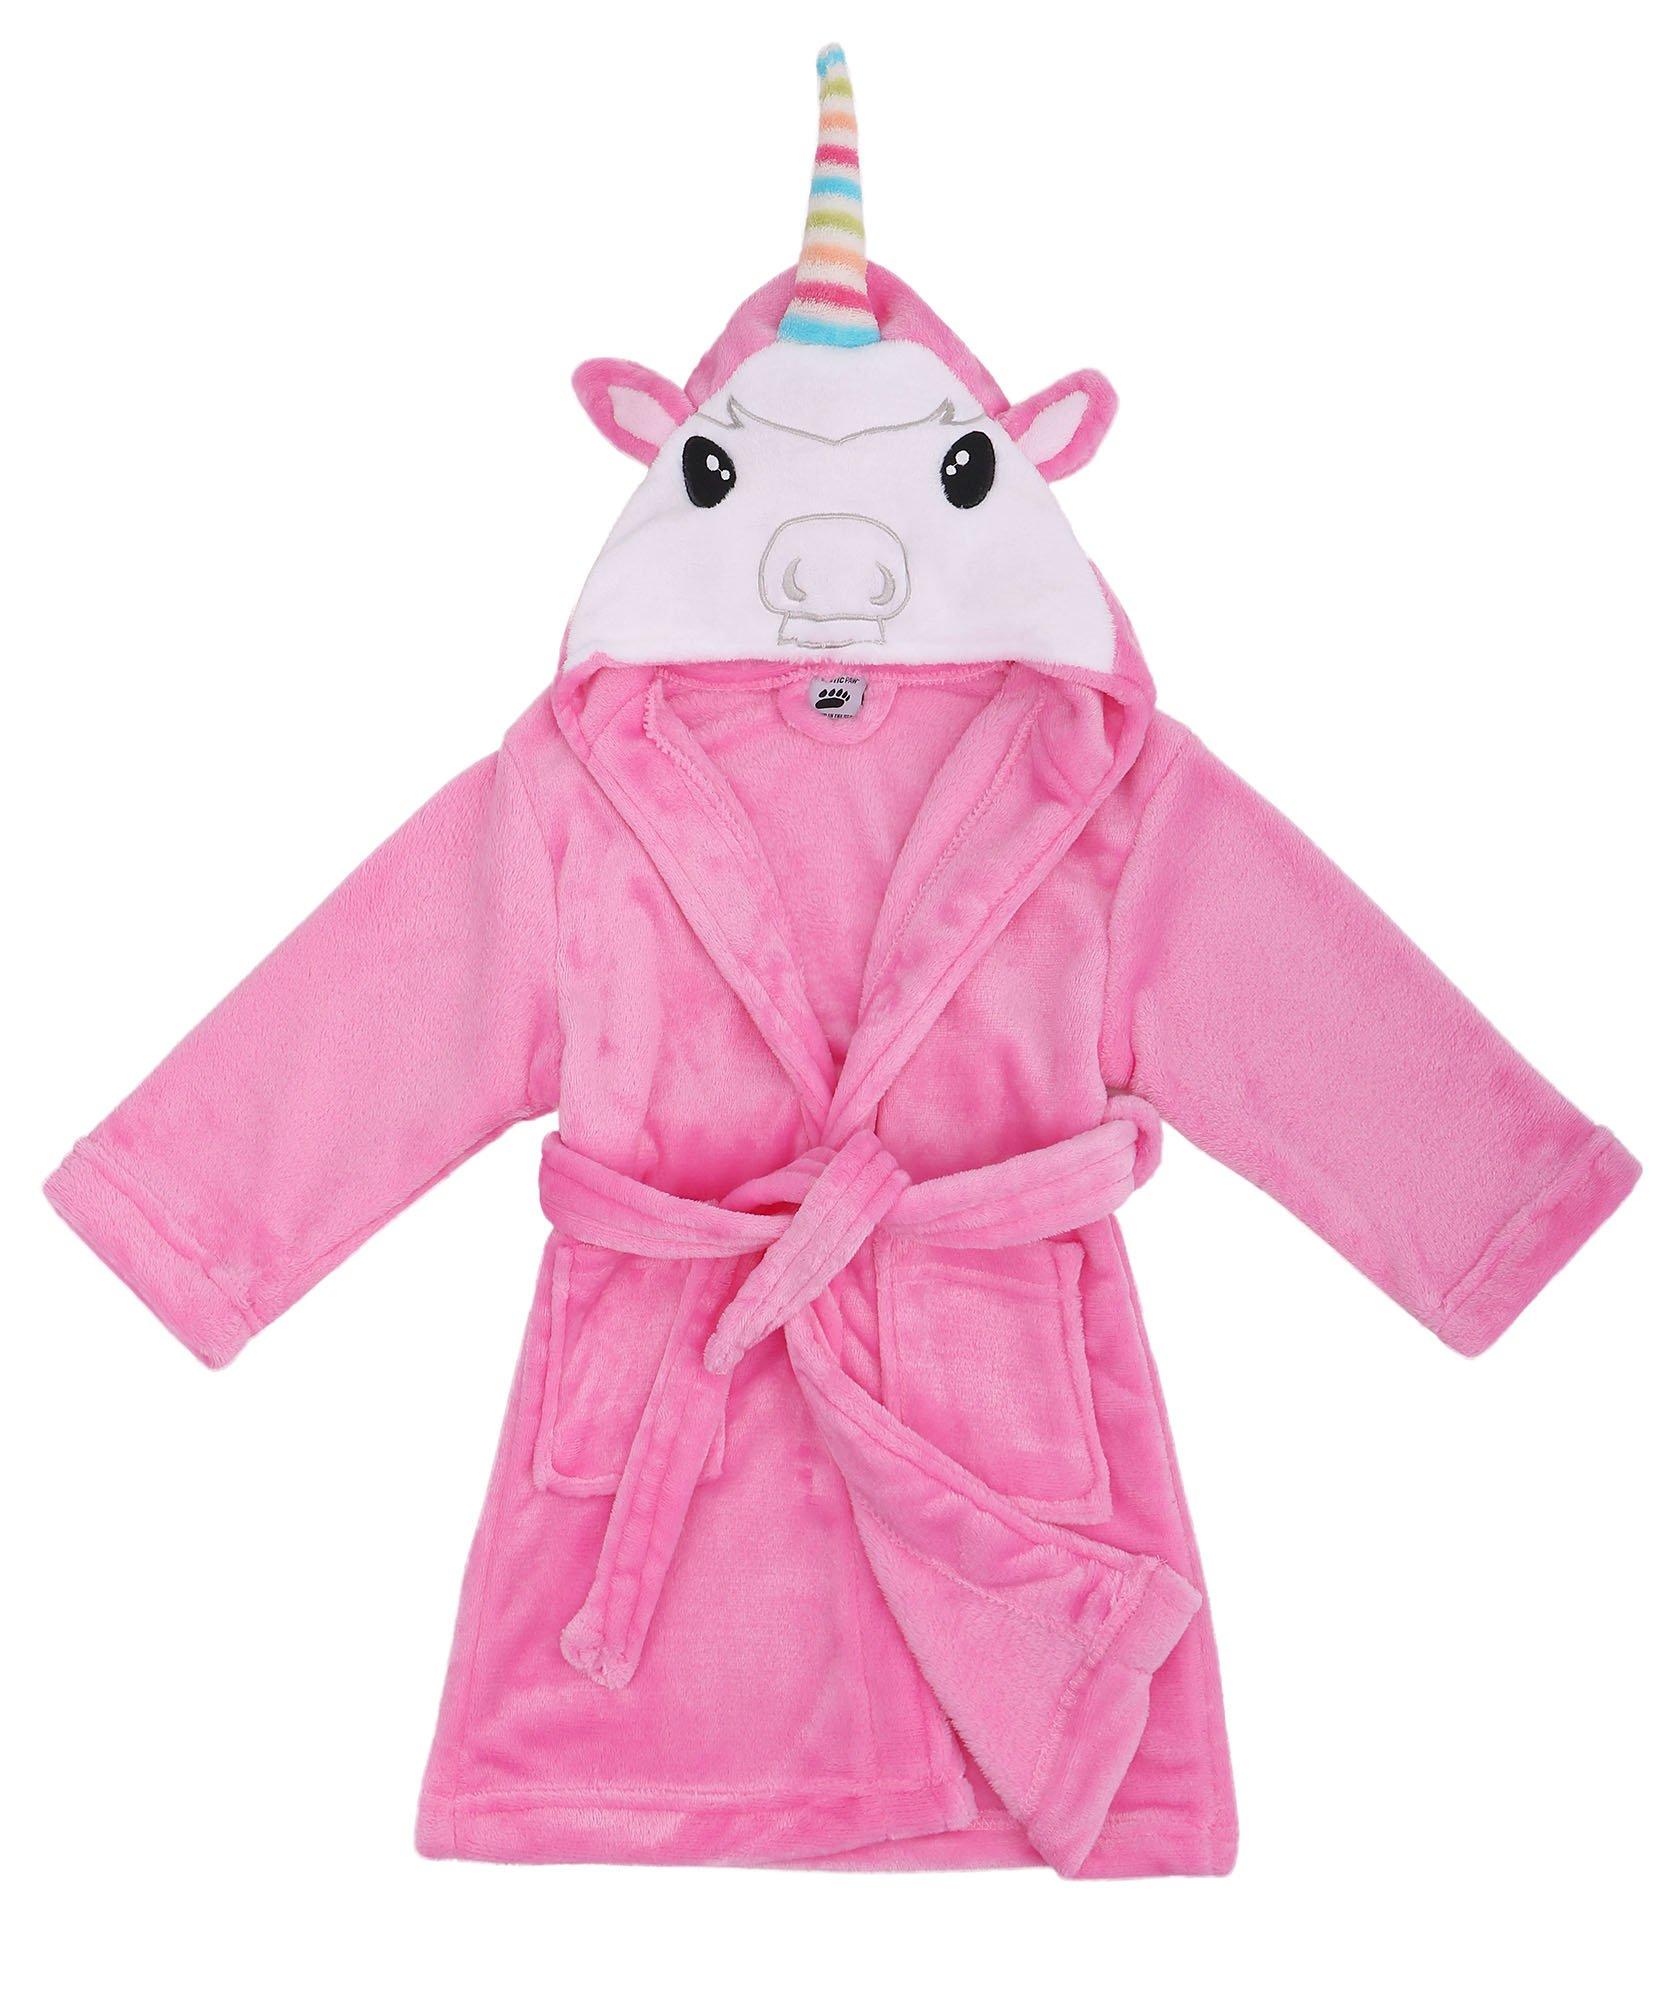 Kids Robe Animal Plush Soft Hooded Terry Bathrobe,Unicorn Pink,S(1-3 Years)